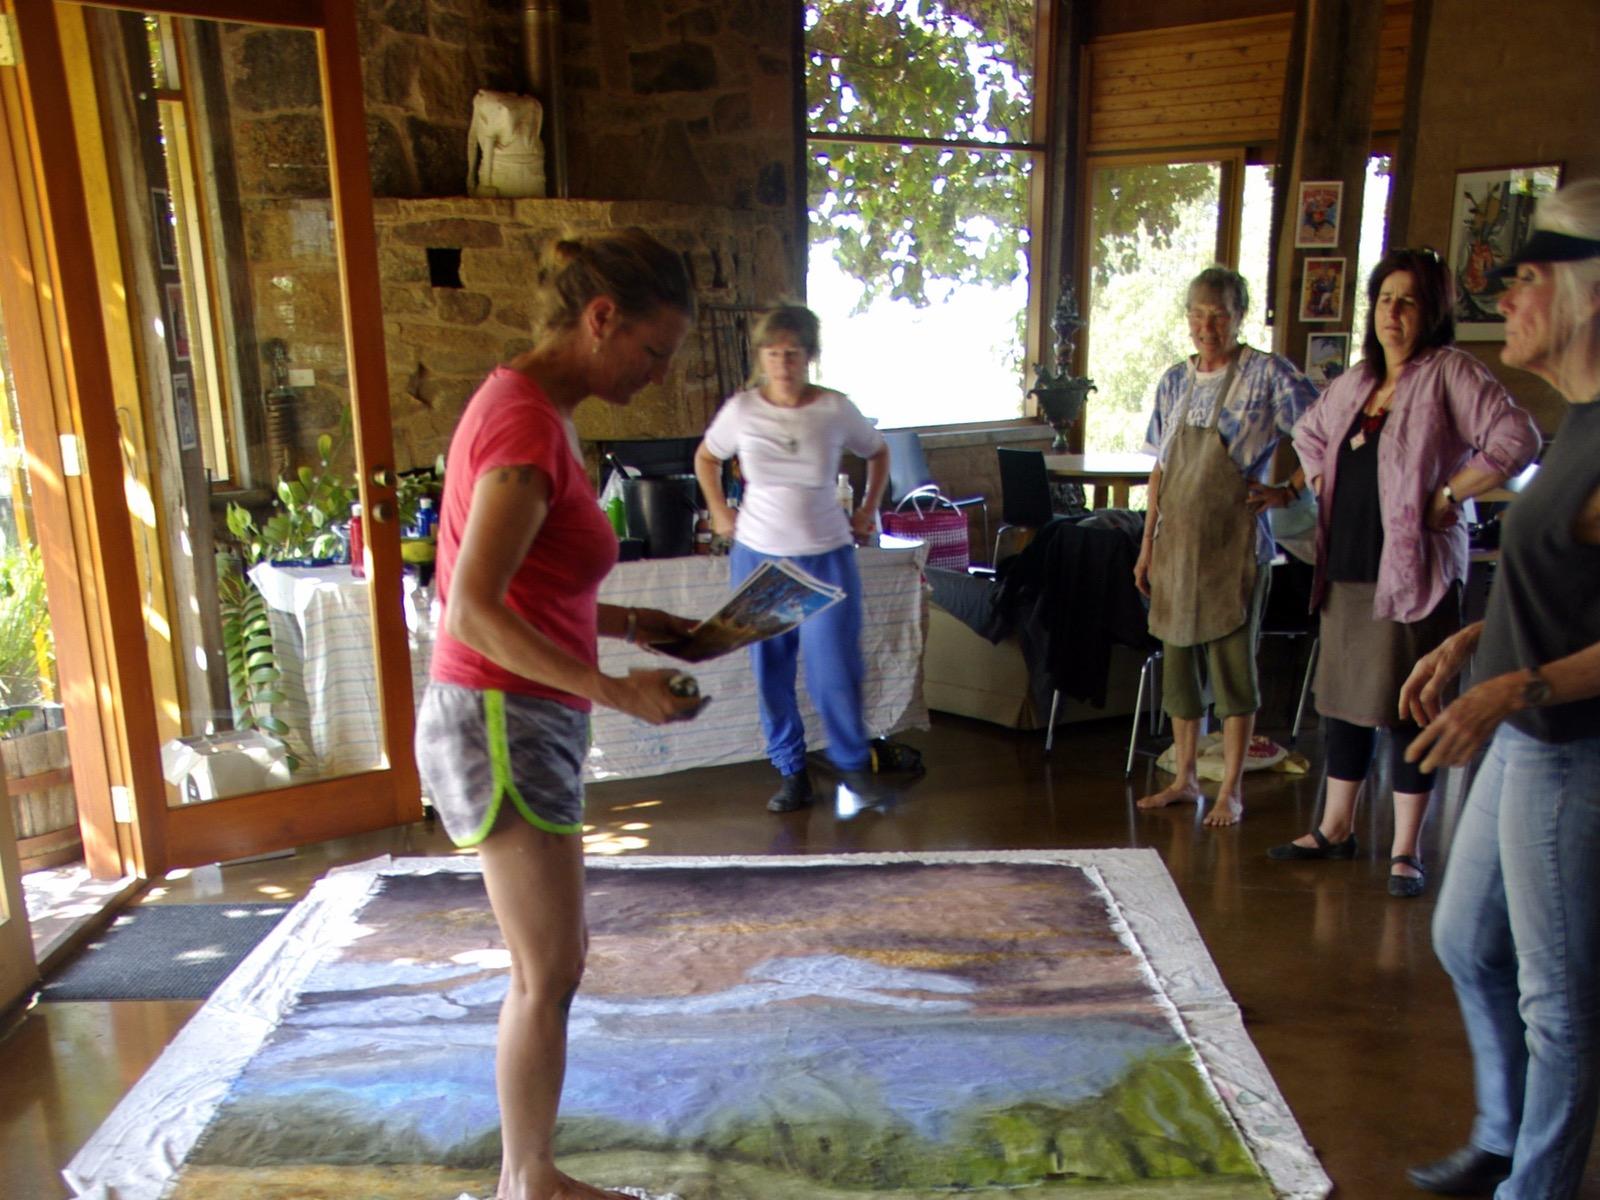 Back to Wangaratta: Across the Arts Forum